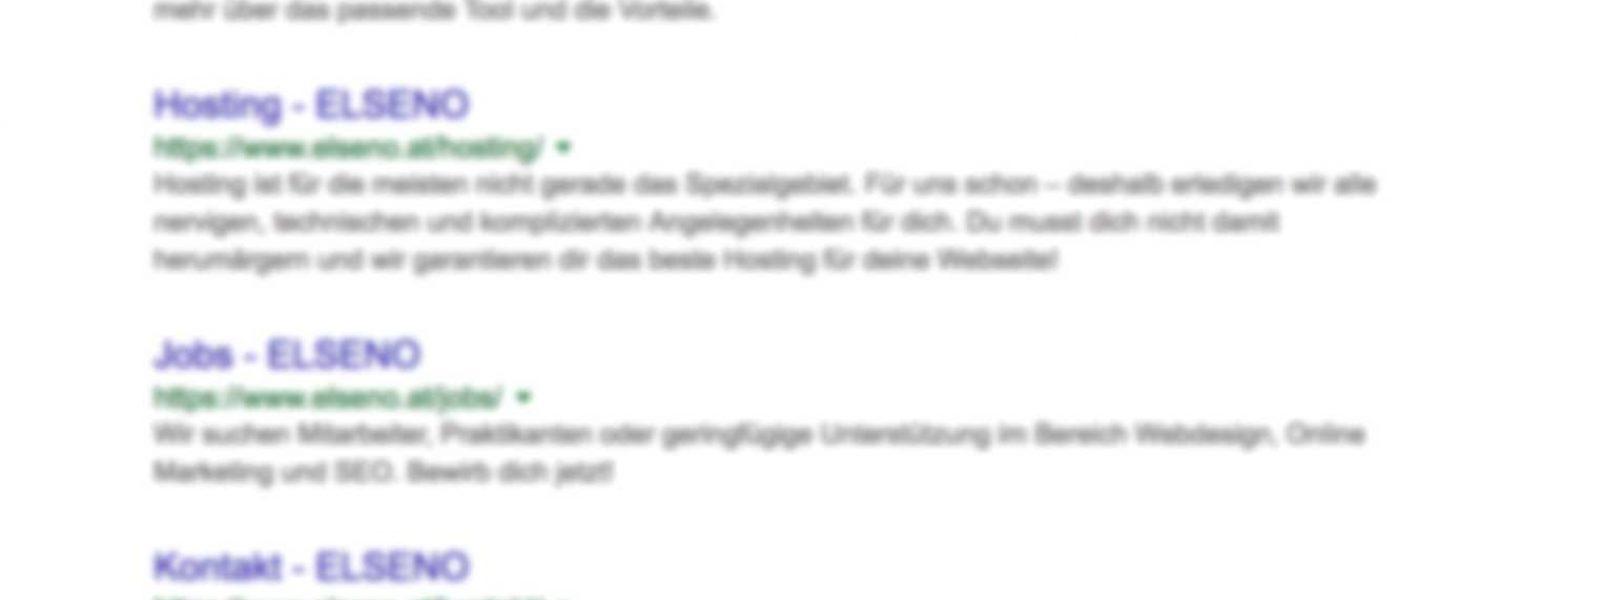 metabeschreibung-elseno